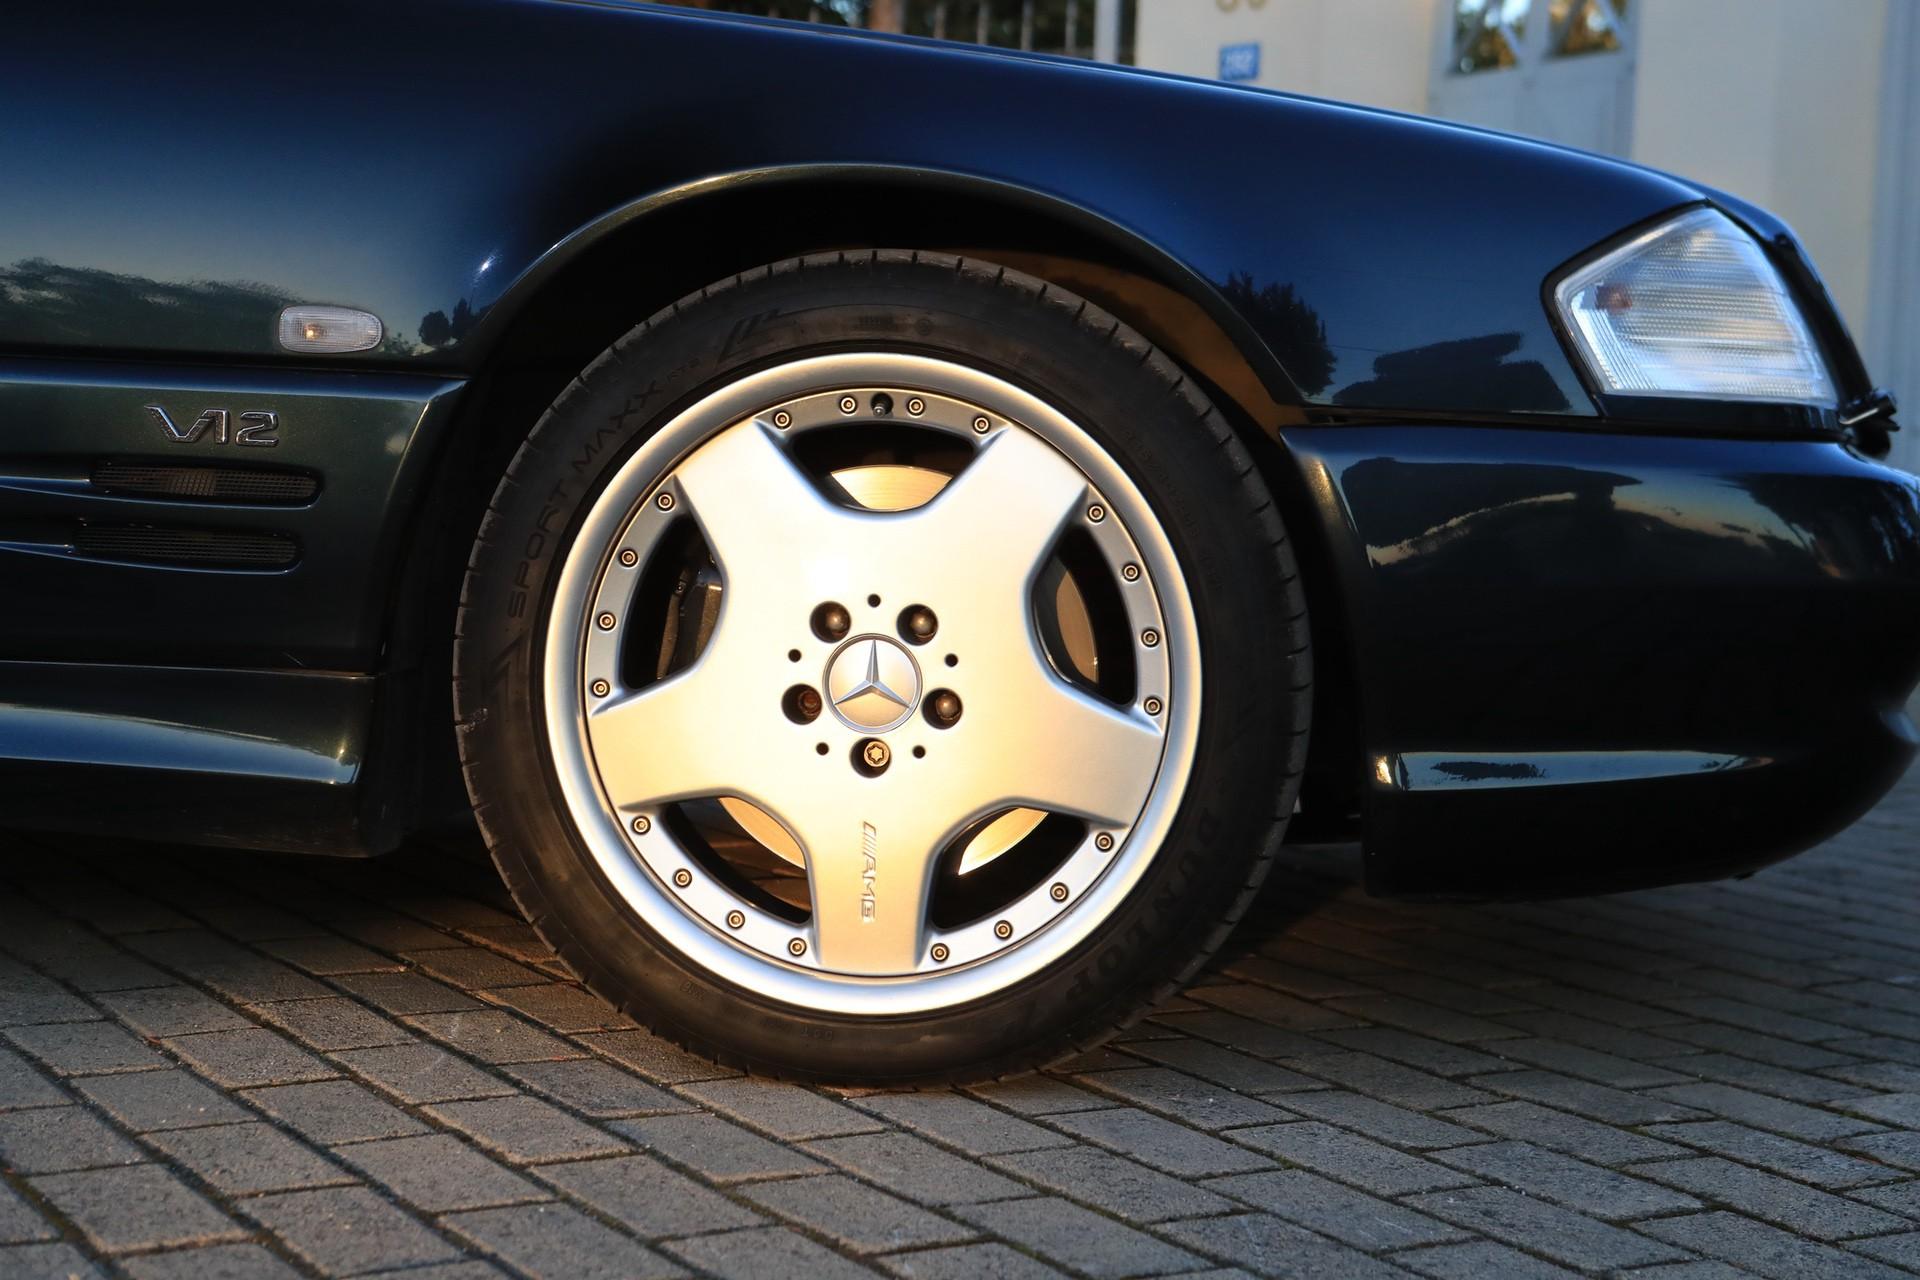 1999-Mercedes-Benz-SL-73-AMG-_32